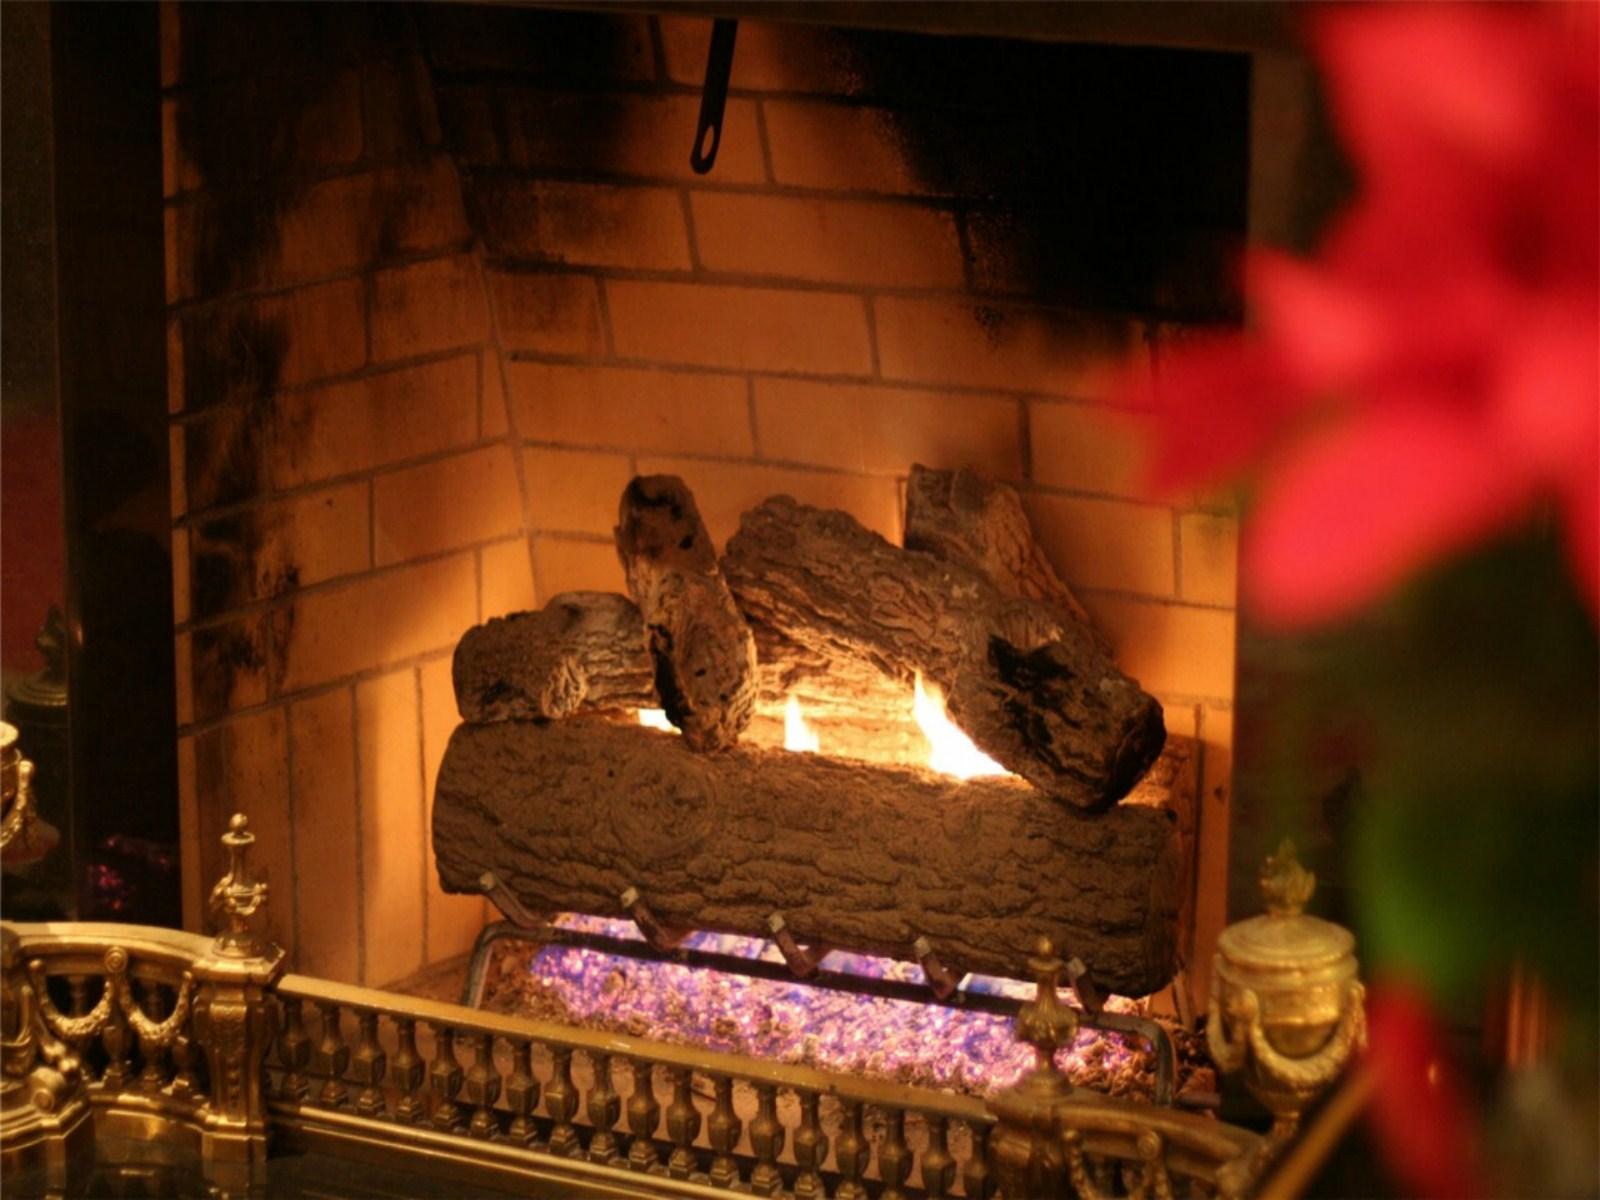 Christmas Fireplace Wallpaper Christmas fireplace desktop 1600x1200